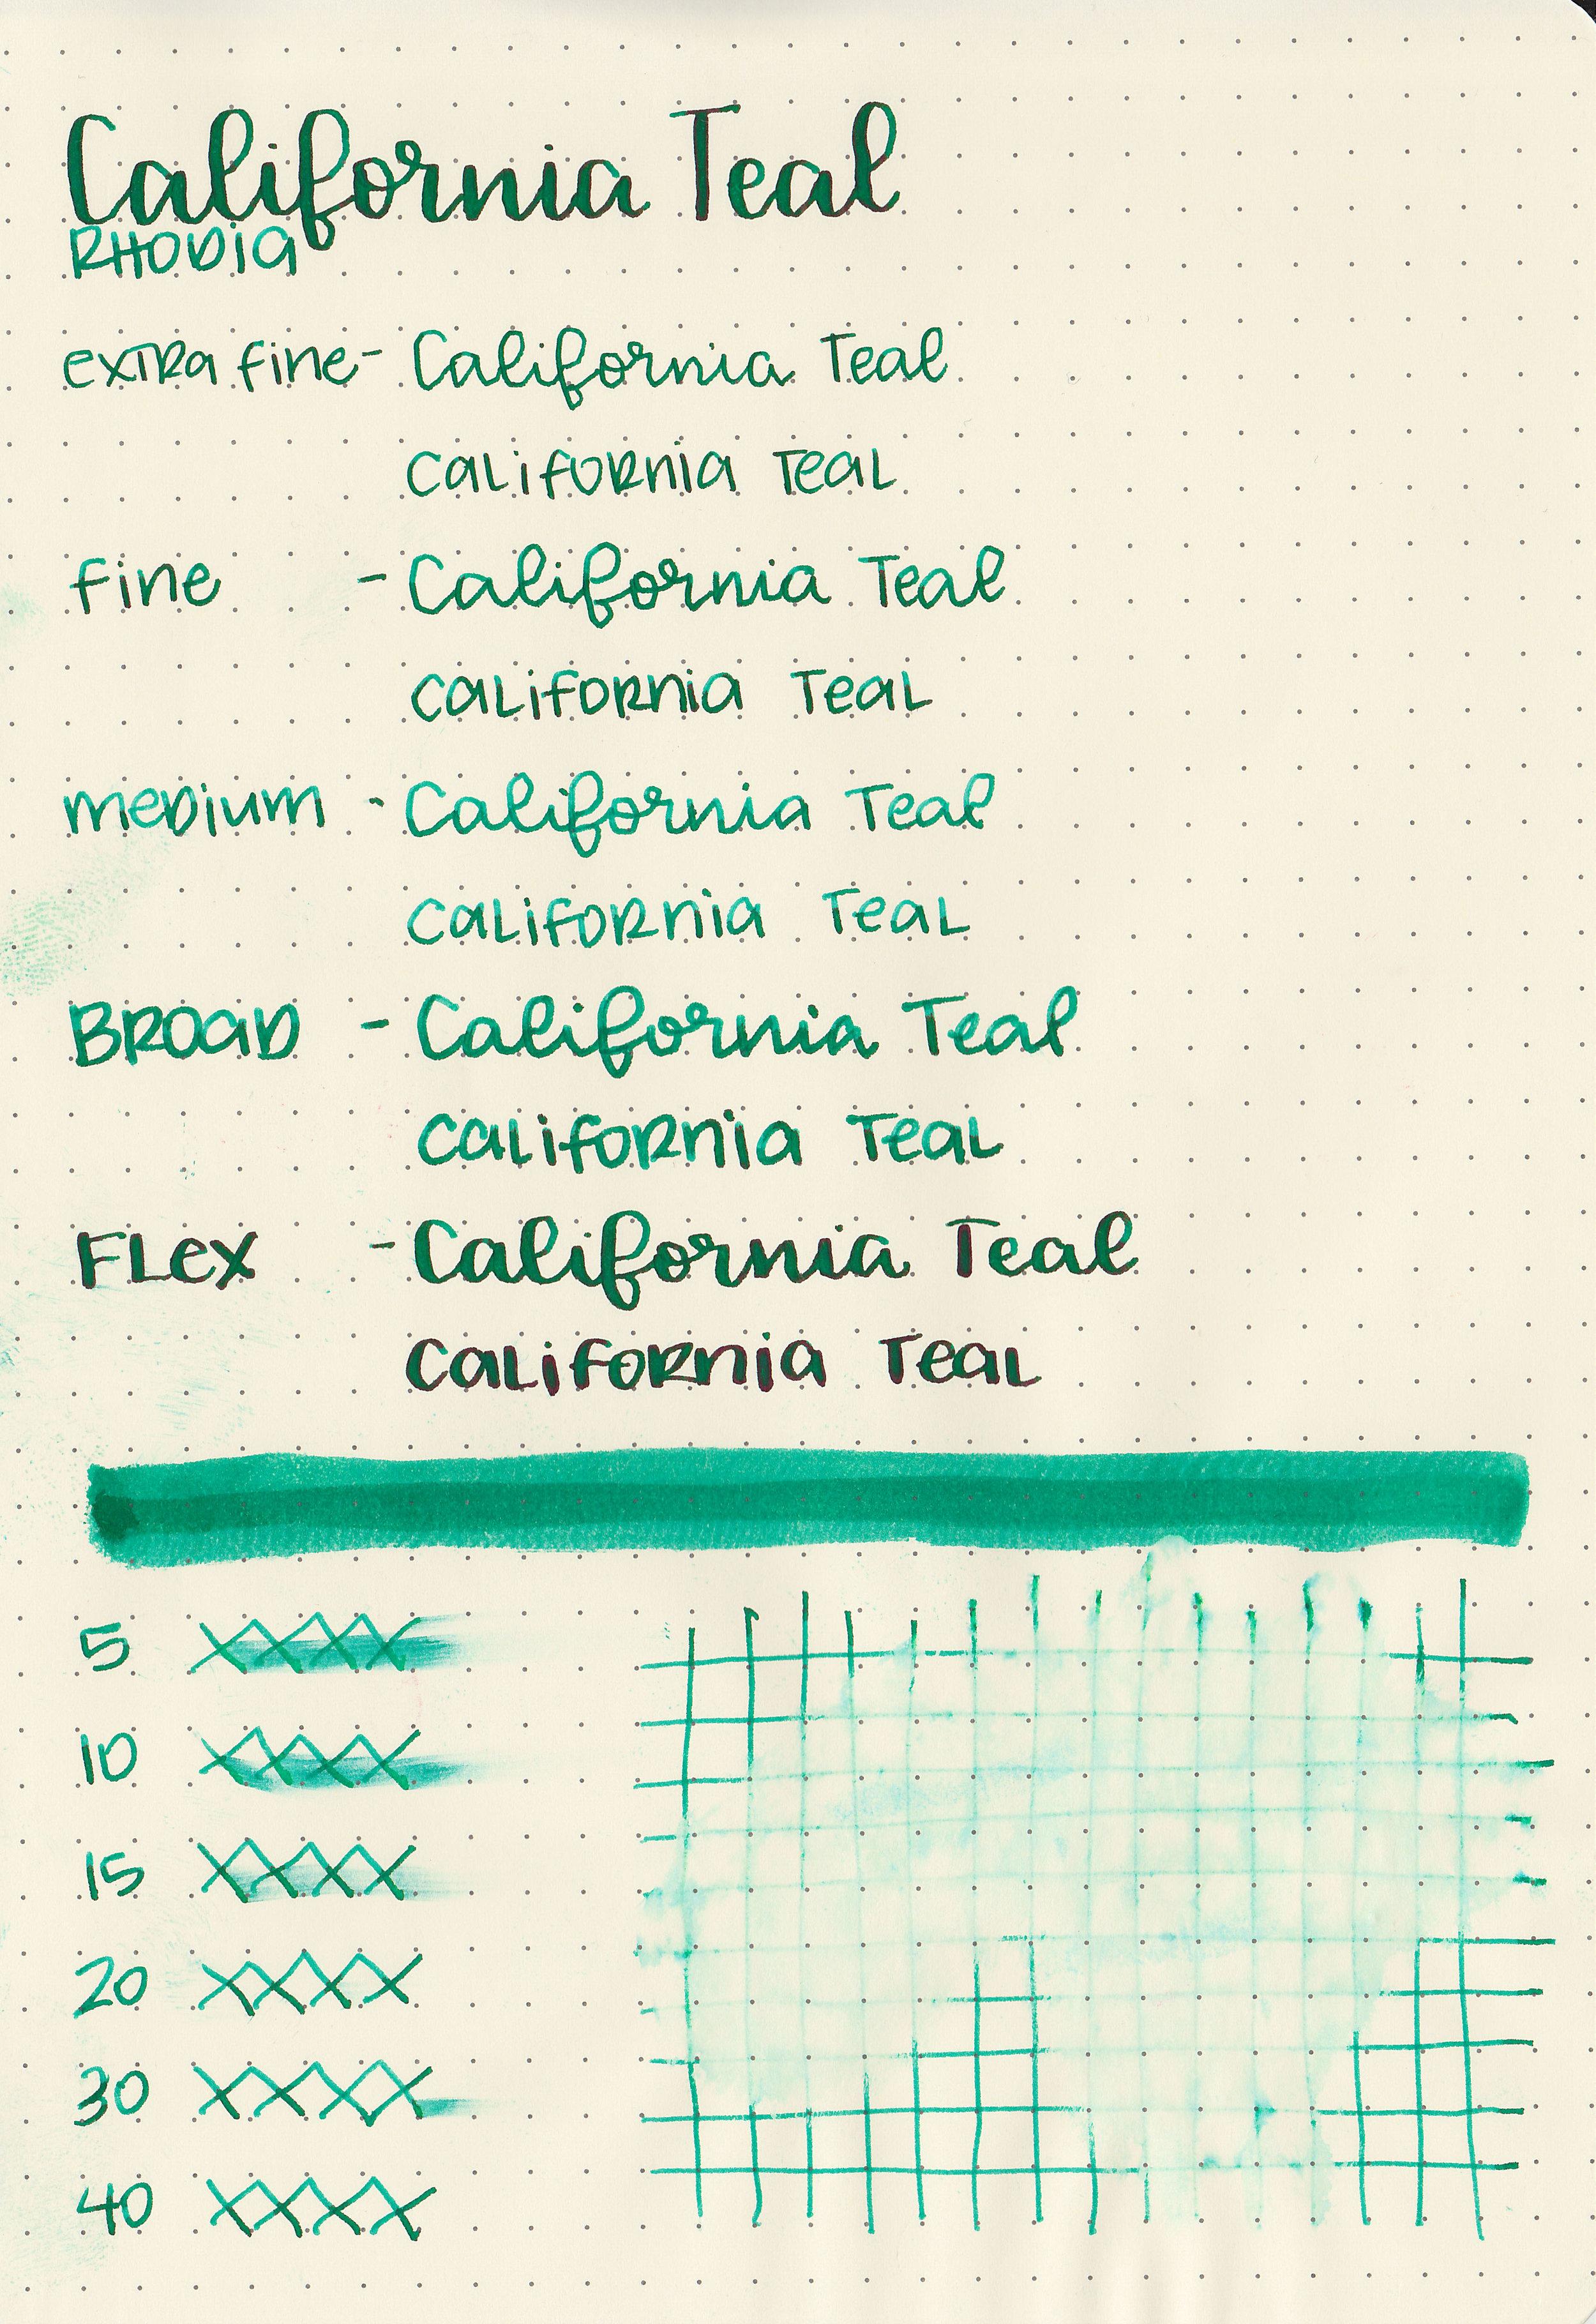 mv-california-teal-5.jpg